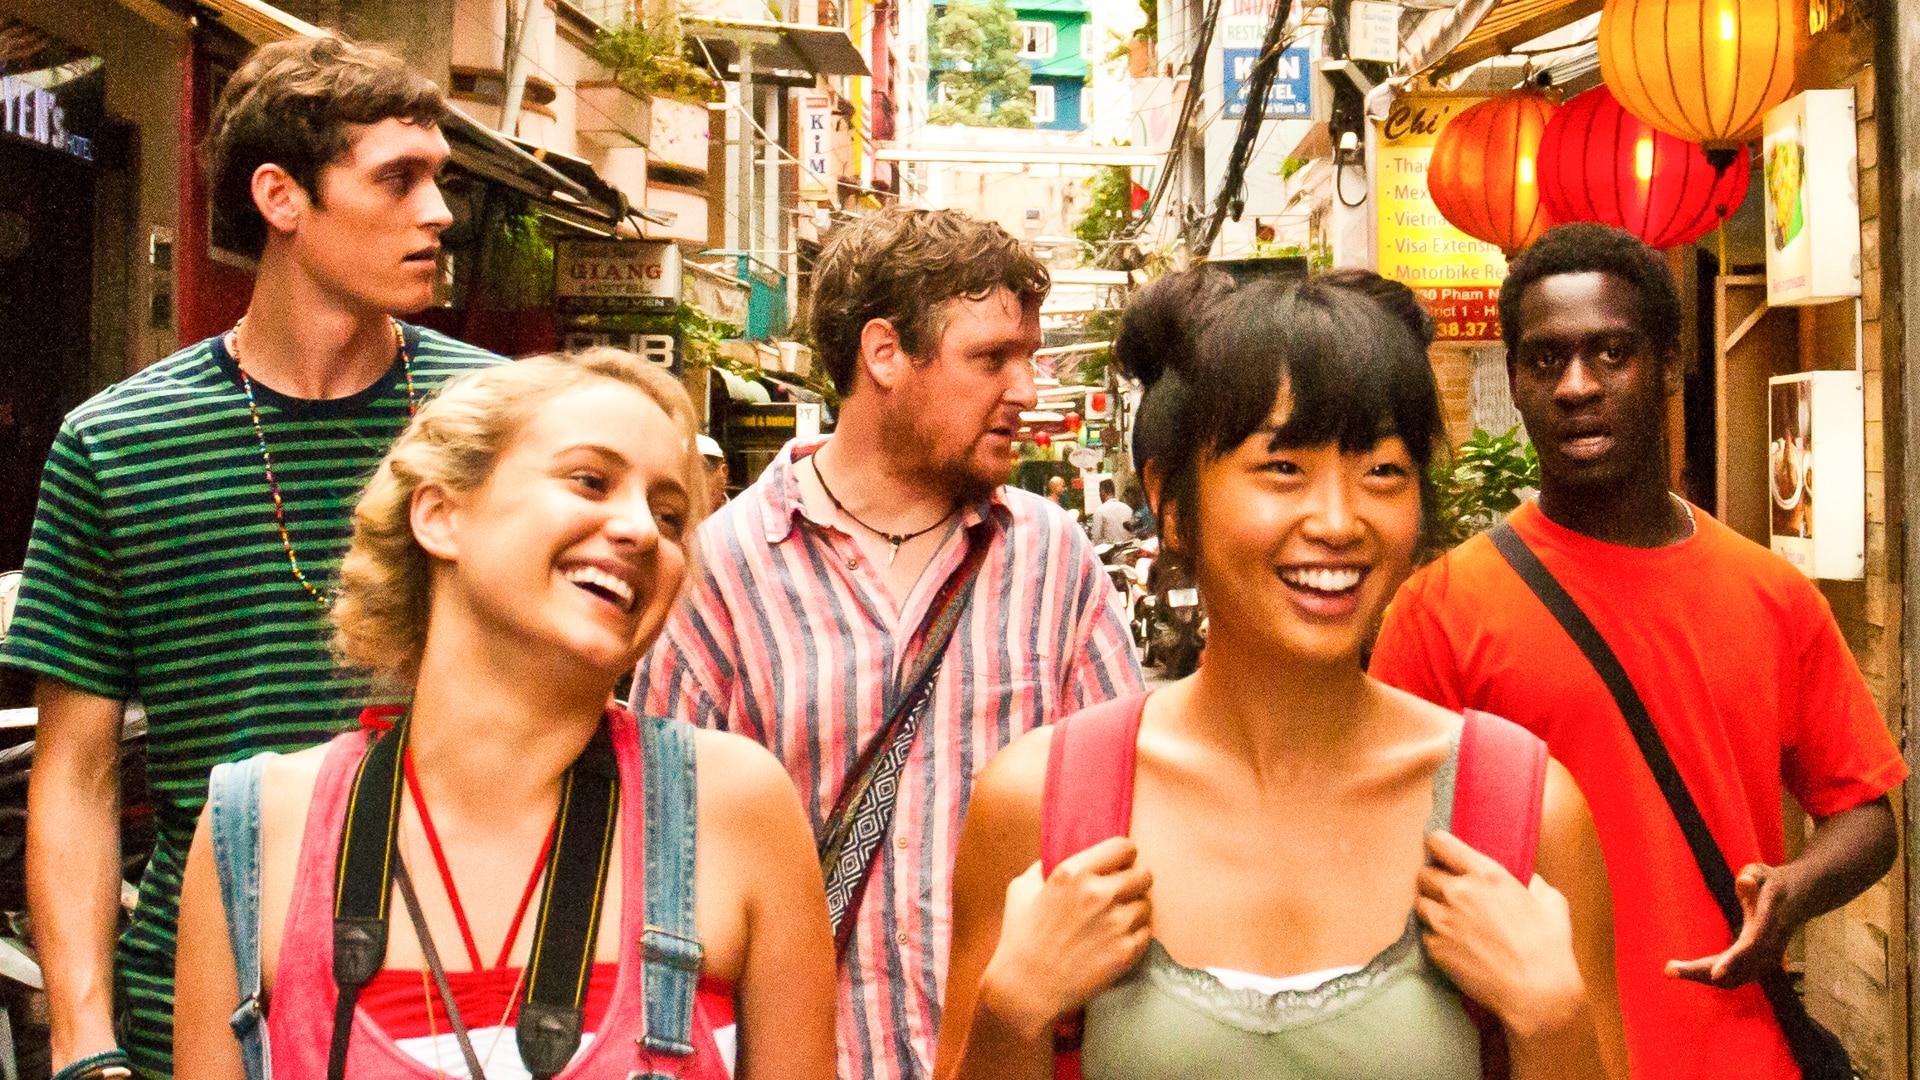 the gap year Gap year意为间隔年、空档年,是西方社会通过近代世界青年旅行方式变迁总结出来的概念。大概意思是西方国家的青年在升学或者毕业之后工作之前(近几年越来.